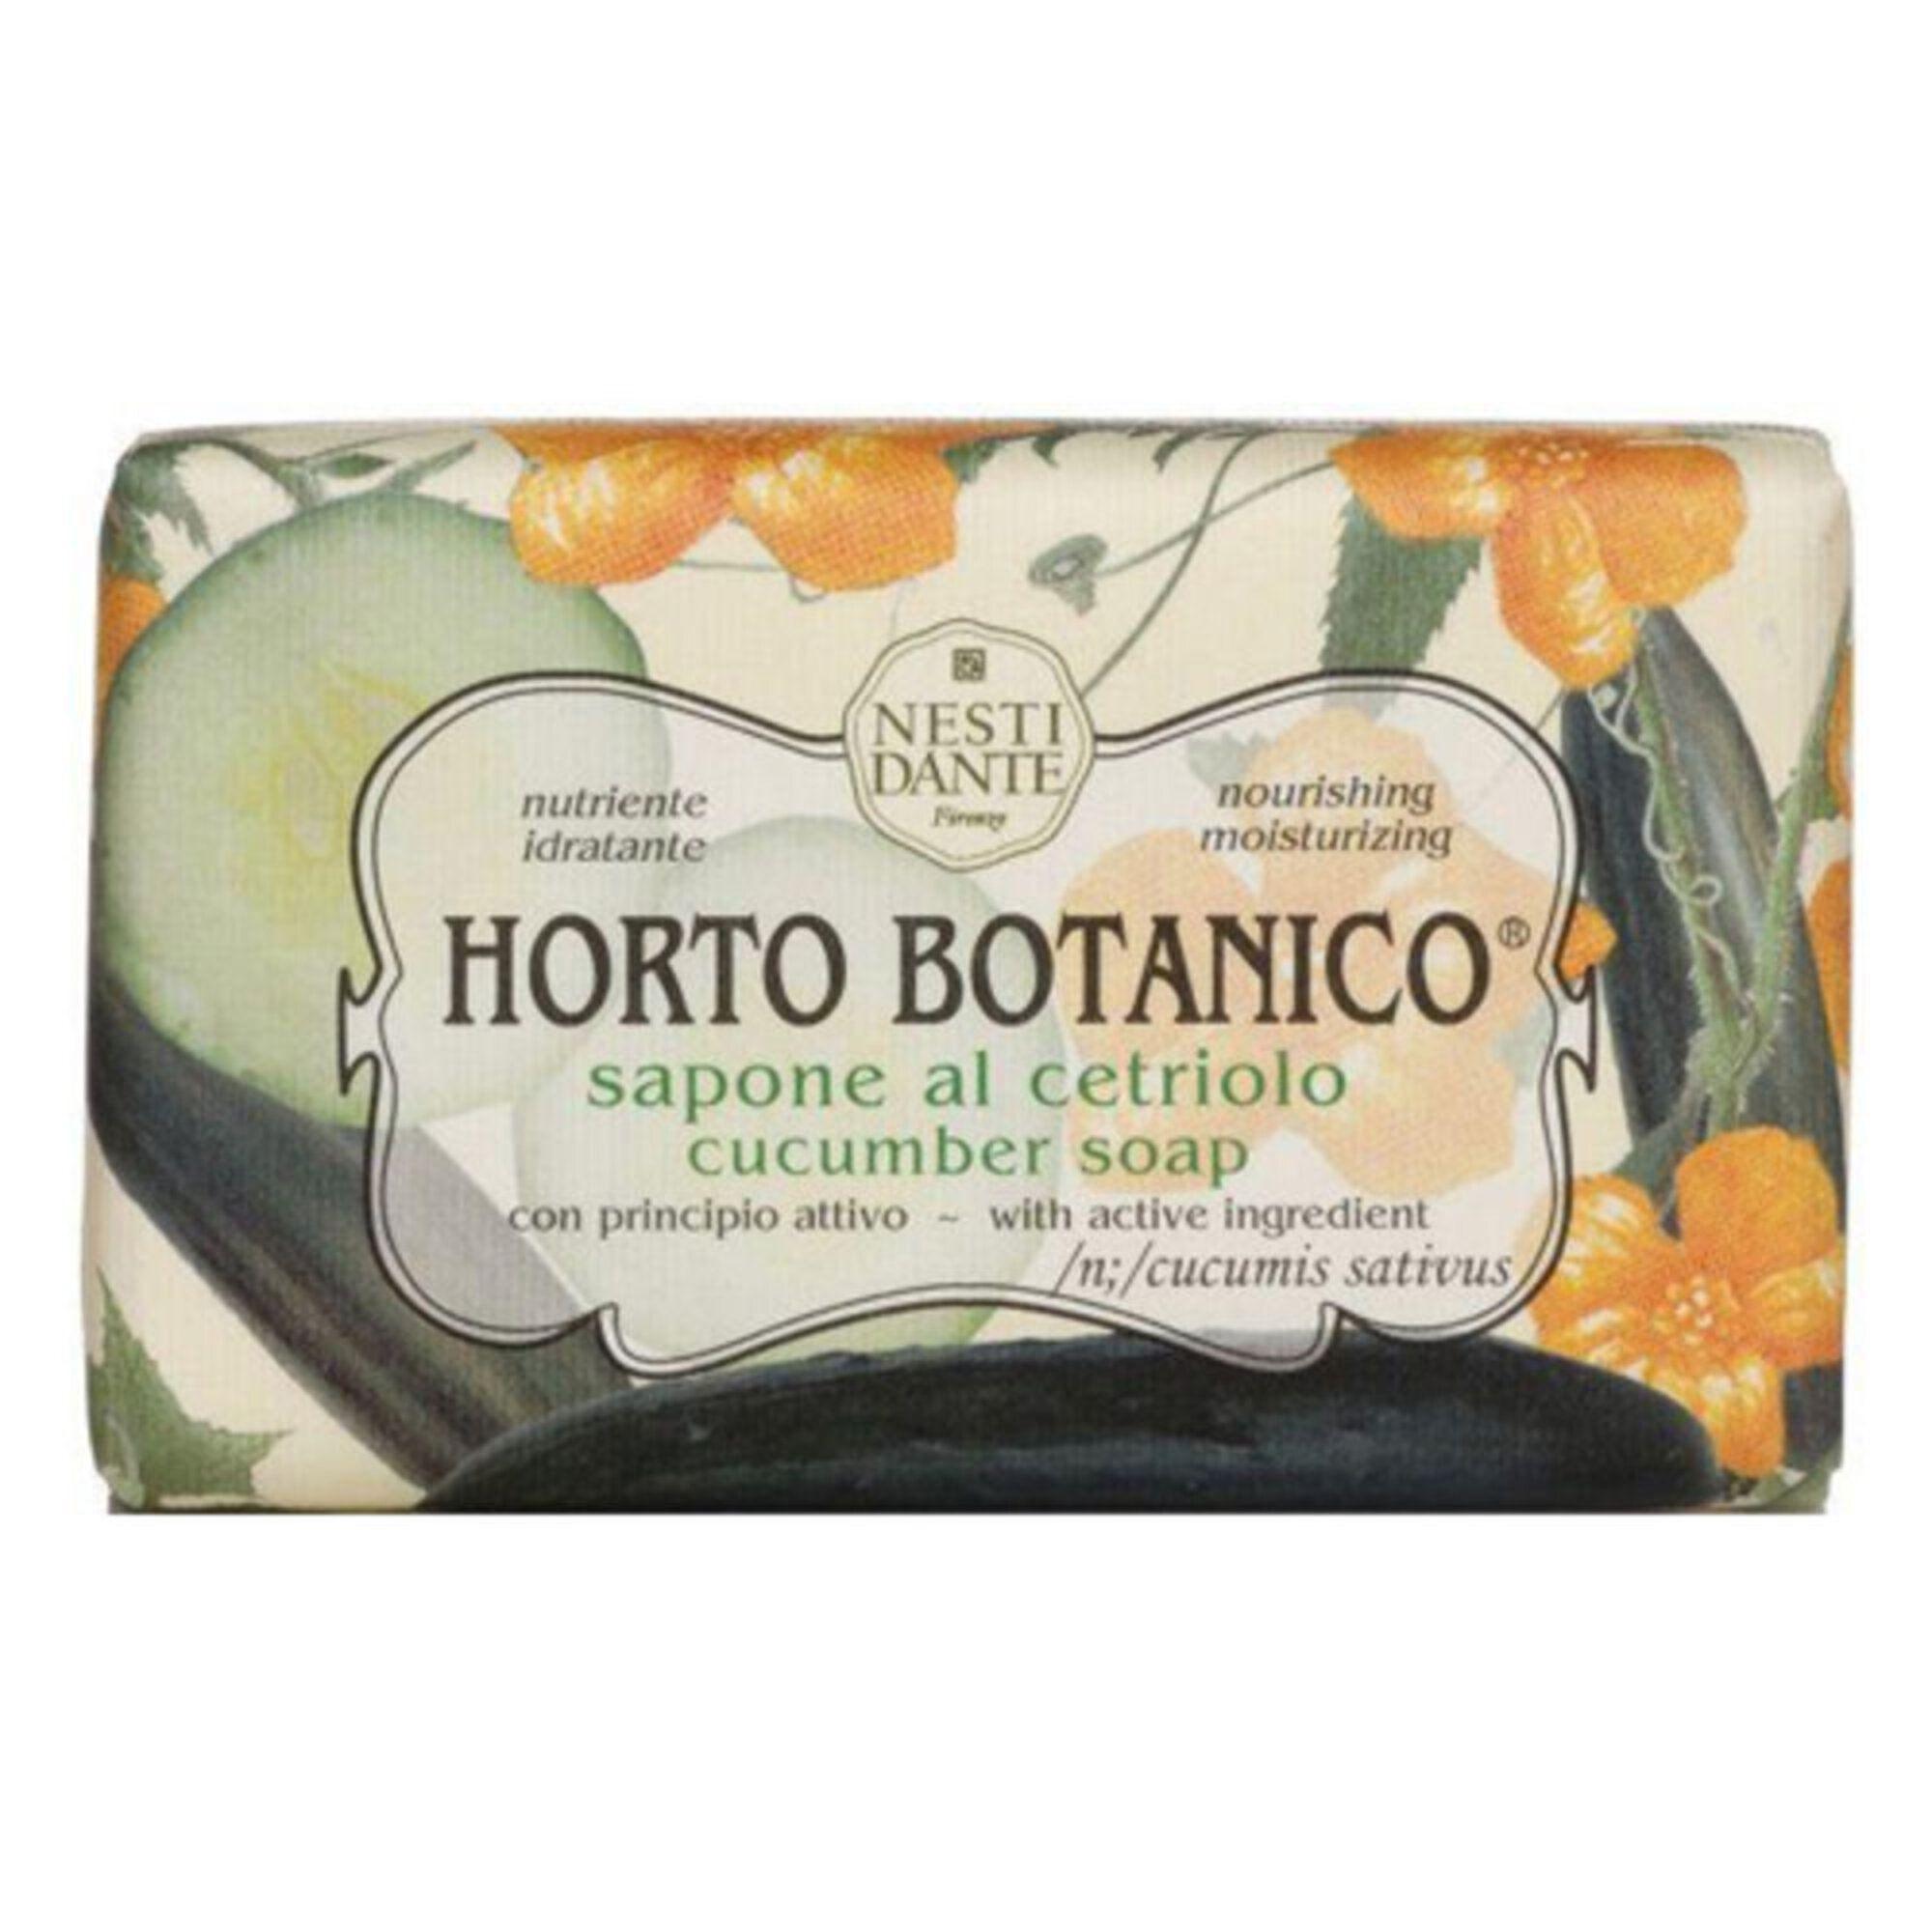 Sabonete Barra Horto Botanico Pepino 250gr Nesti Dante